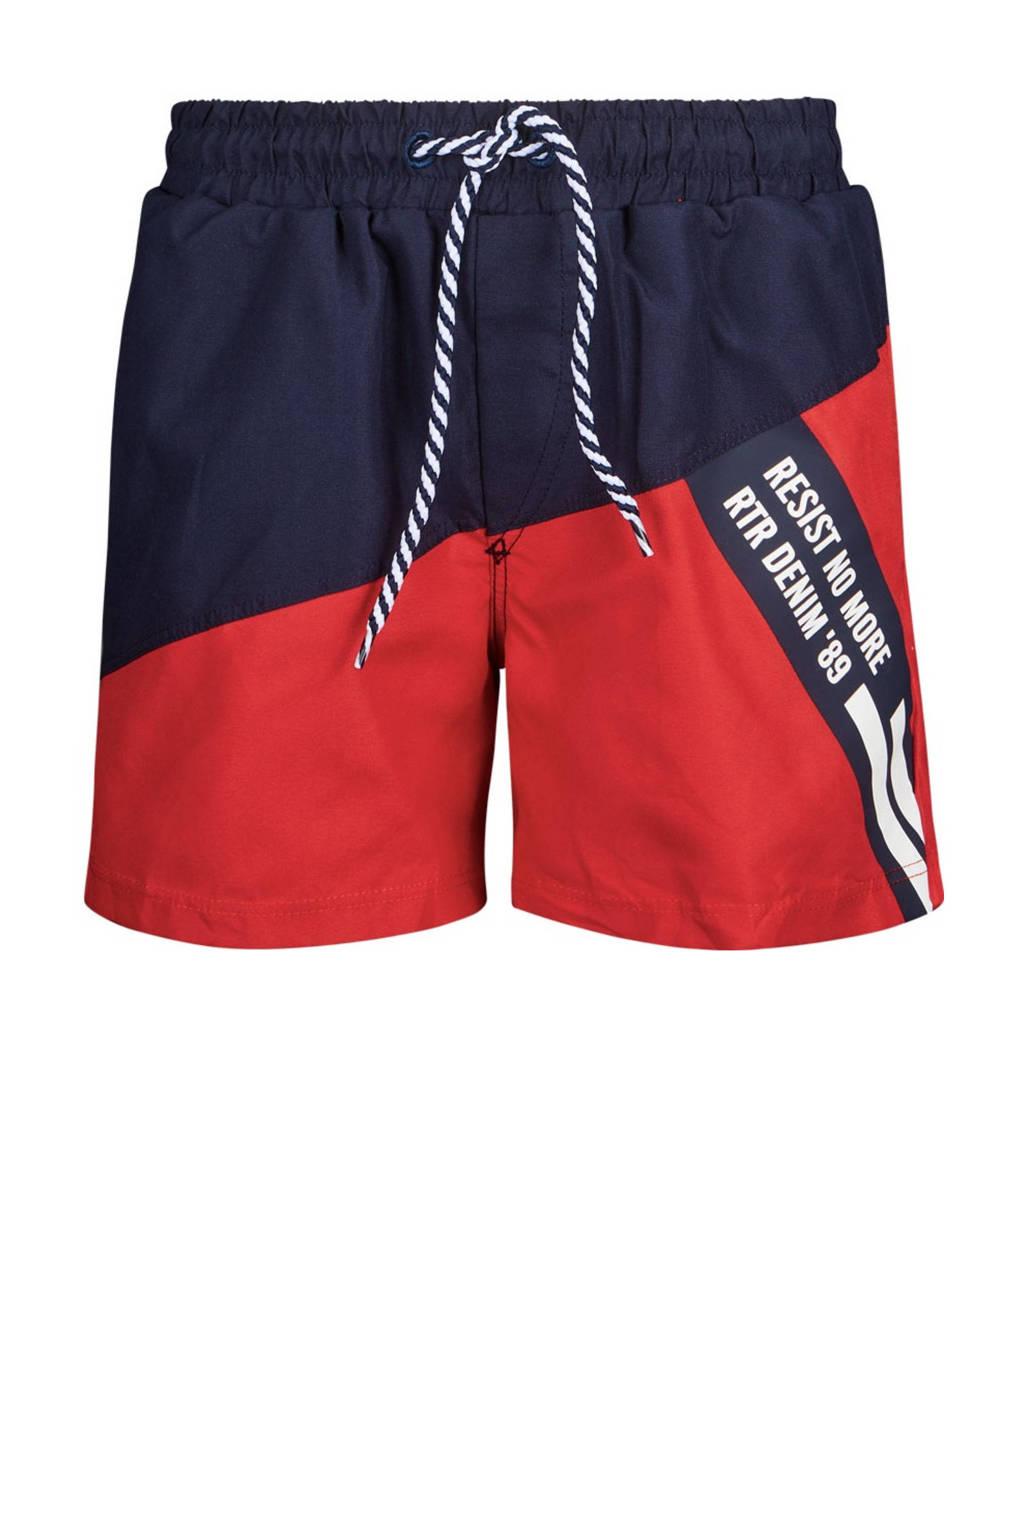 Retour Denim zwemshort Yuri rood/donkerblauw, Rood/donkerblauw